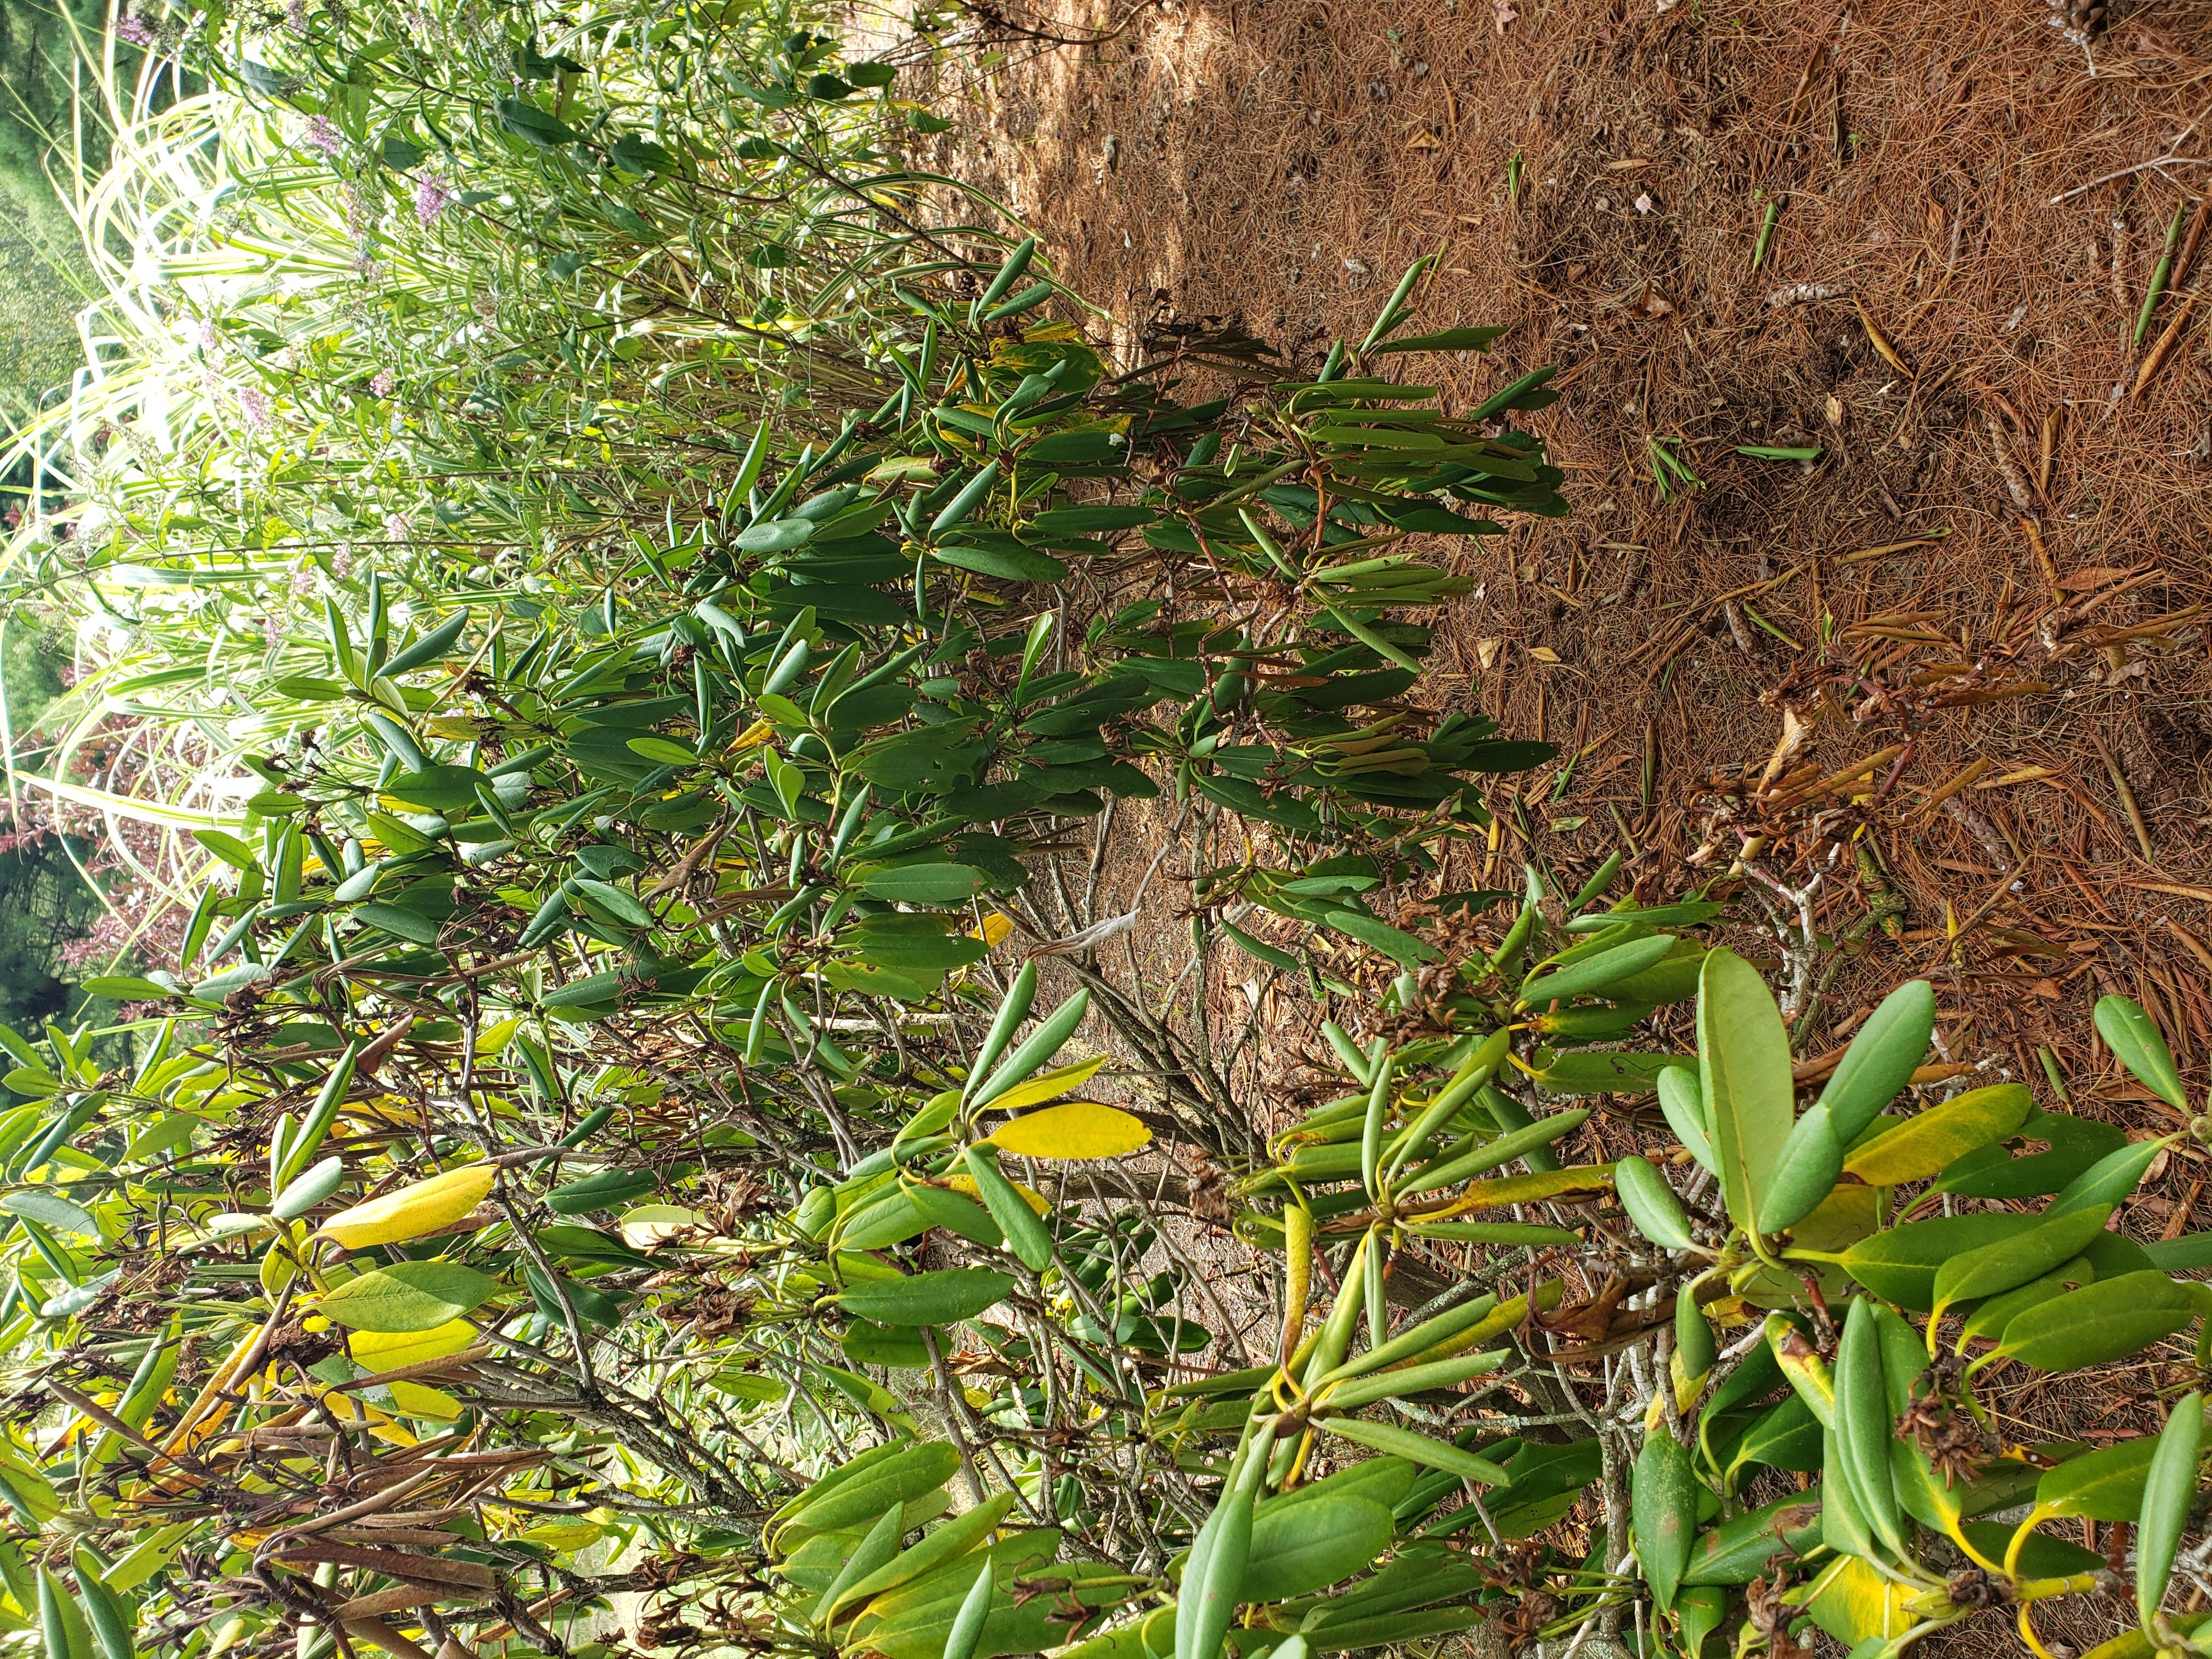 Broadleaf_Rhododendron_2